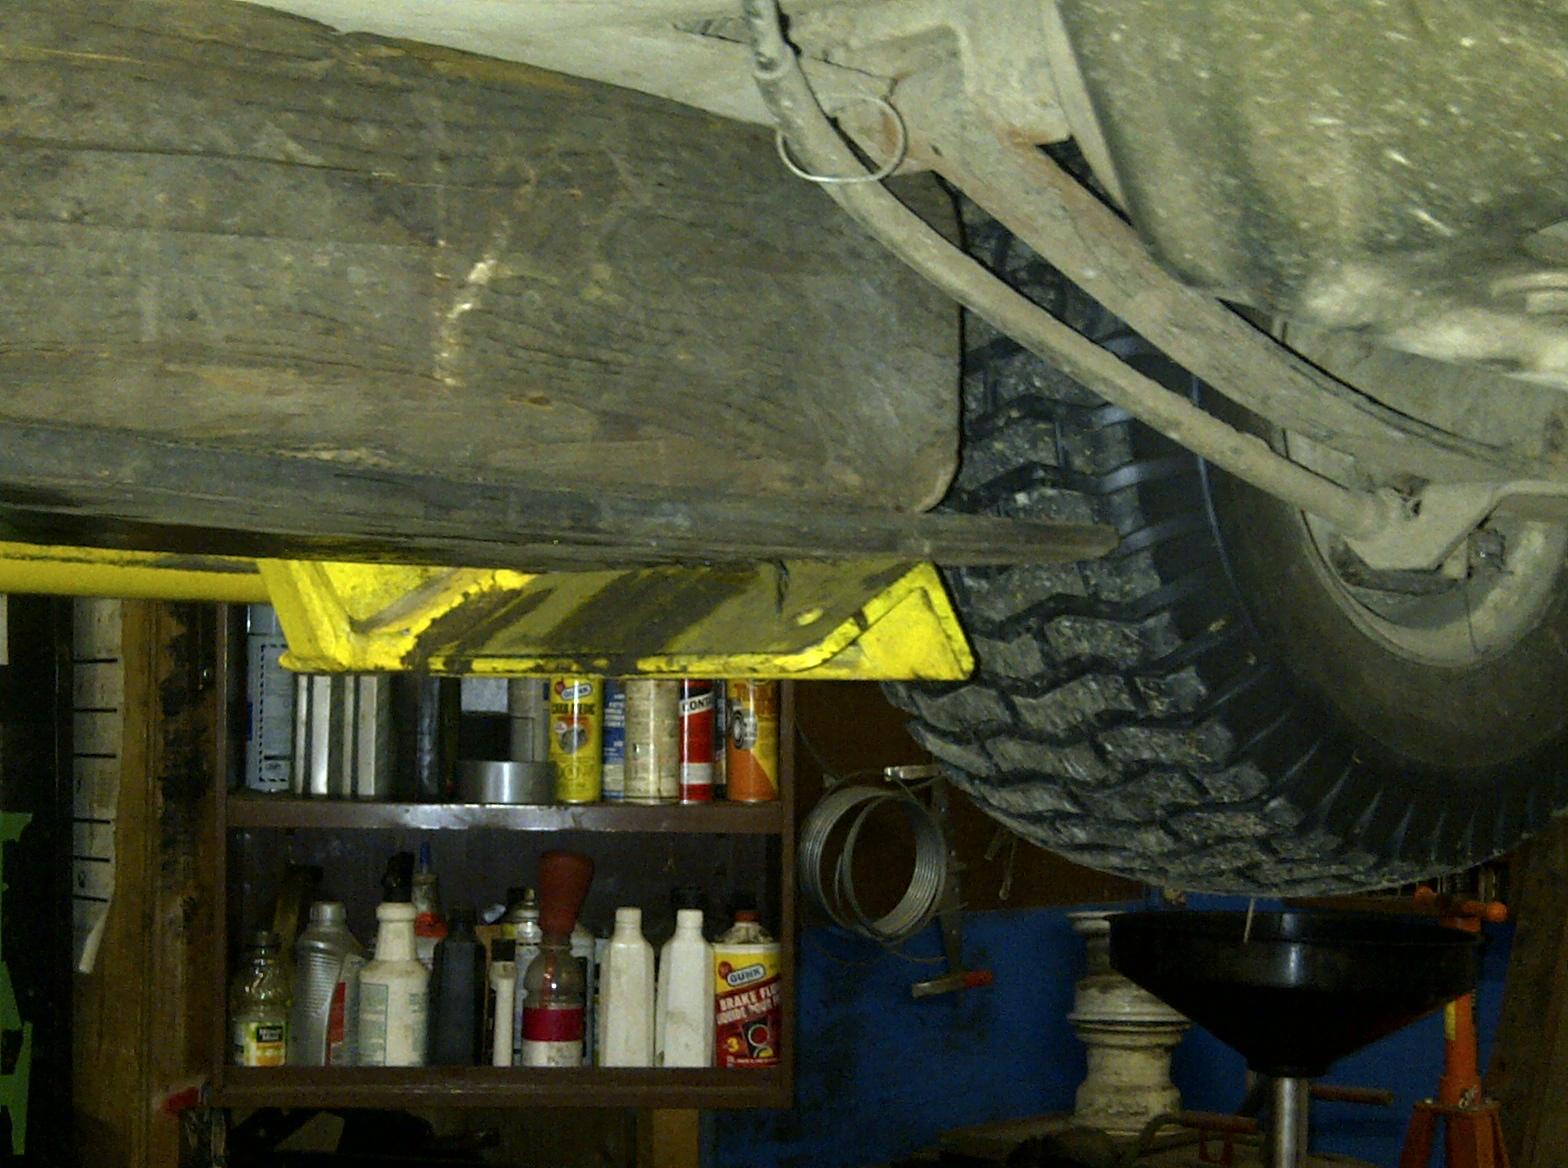 Bobs Shop Club Car Rear End Bearing Noise Carryall 272 Wiring Diagram